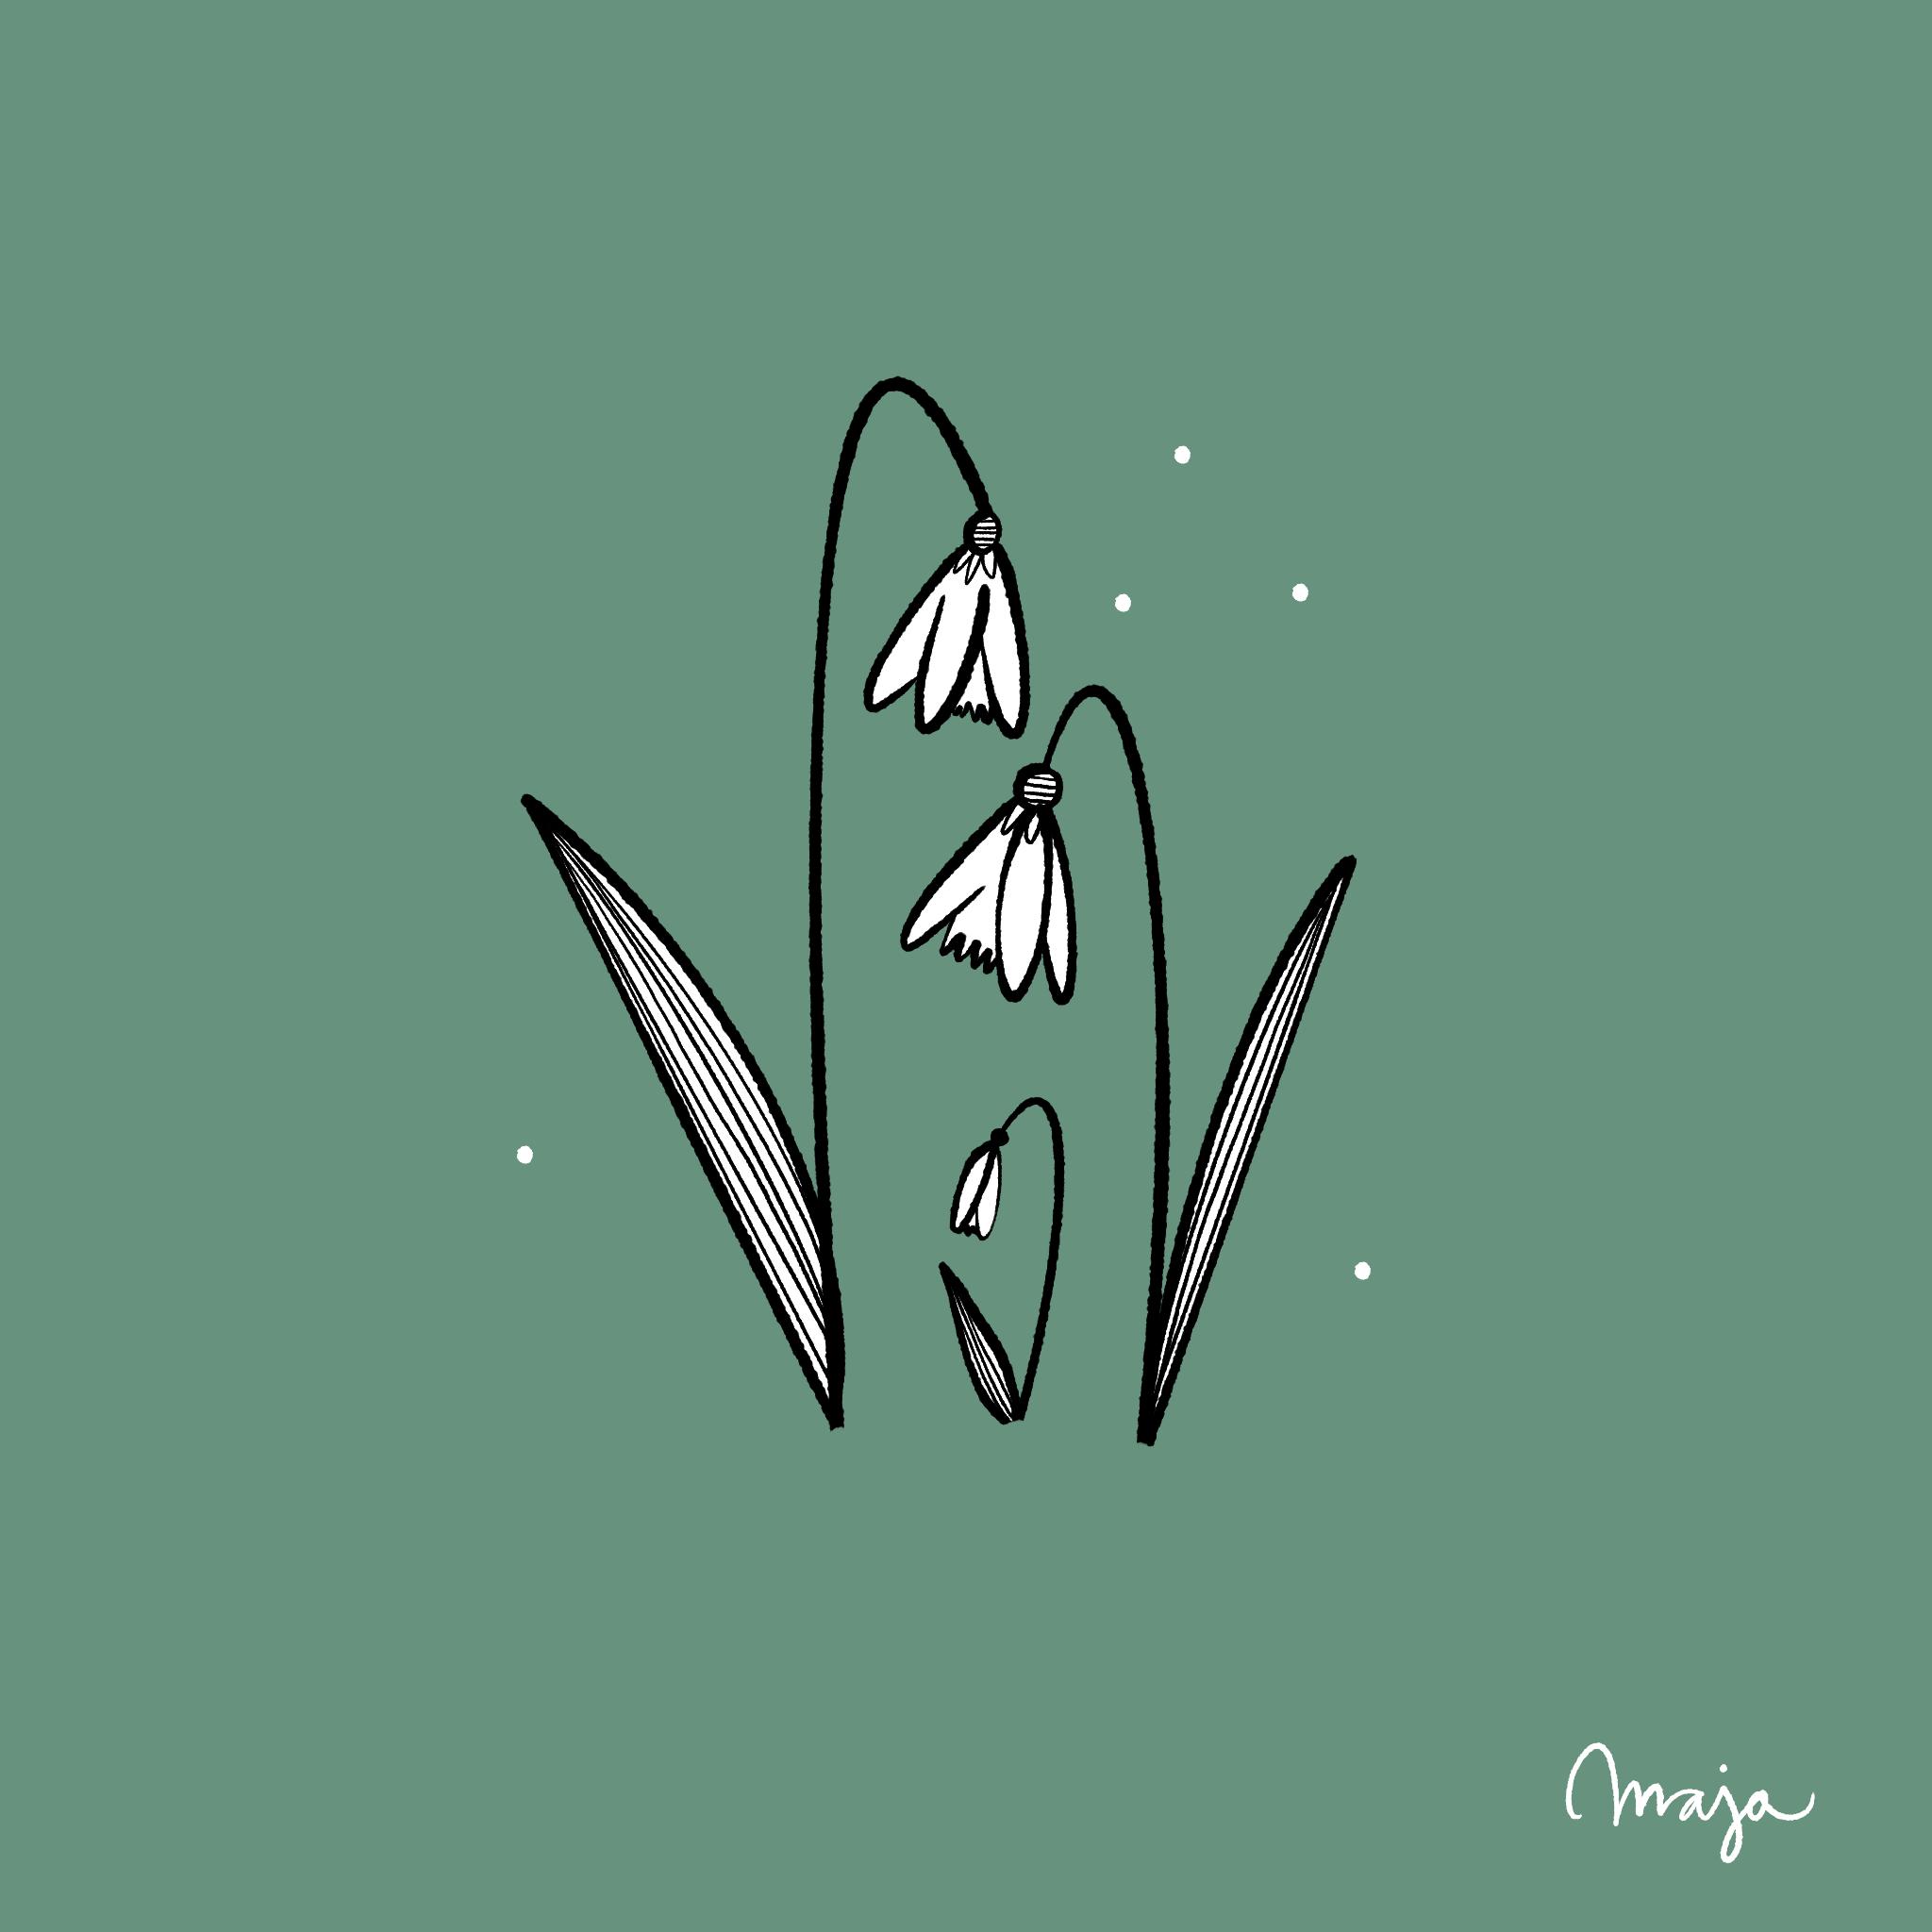 snödroppe illustration ritakurs